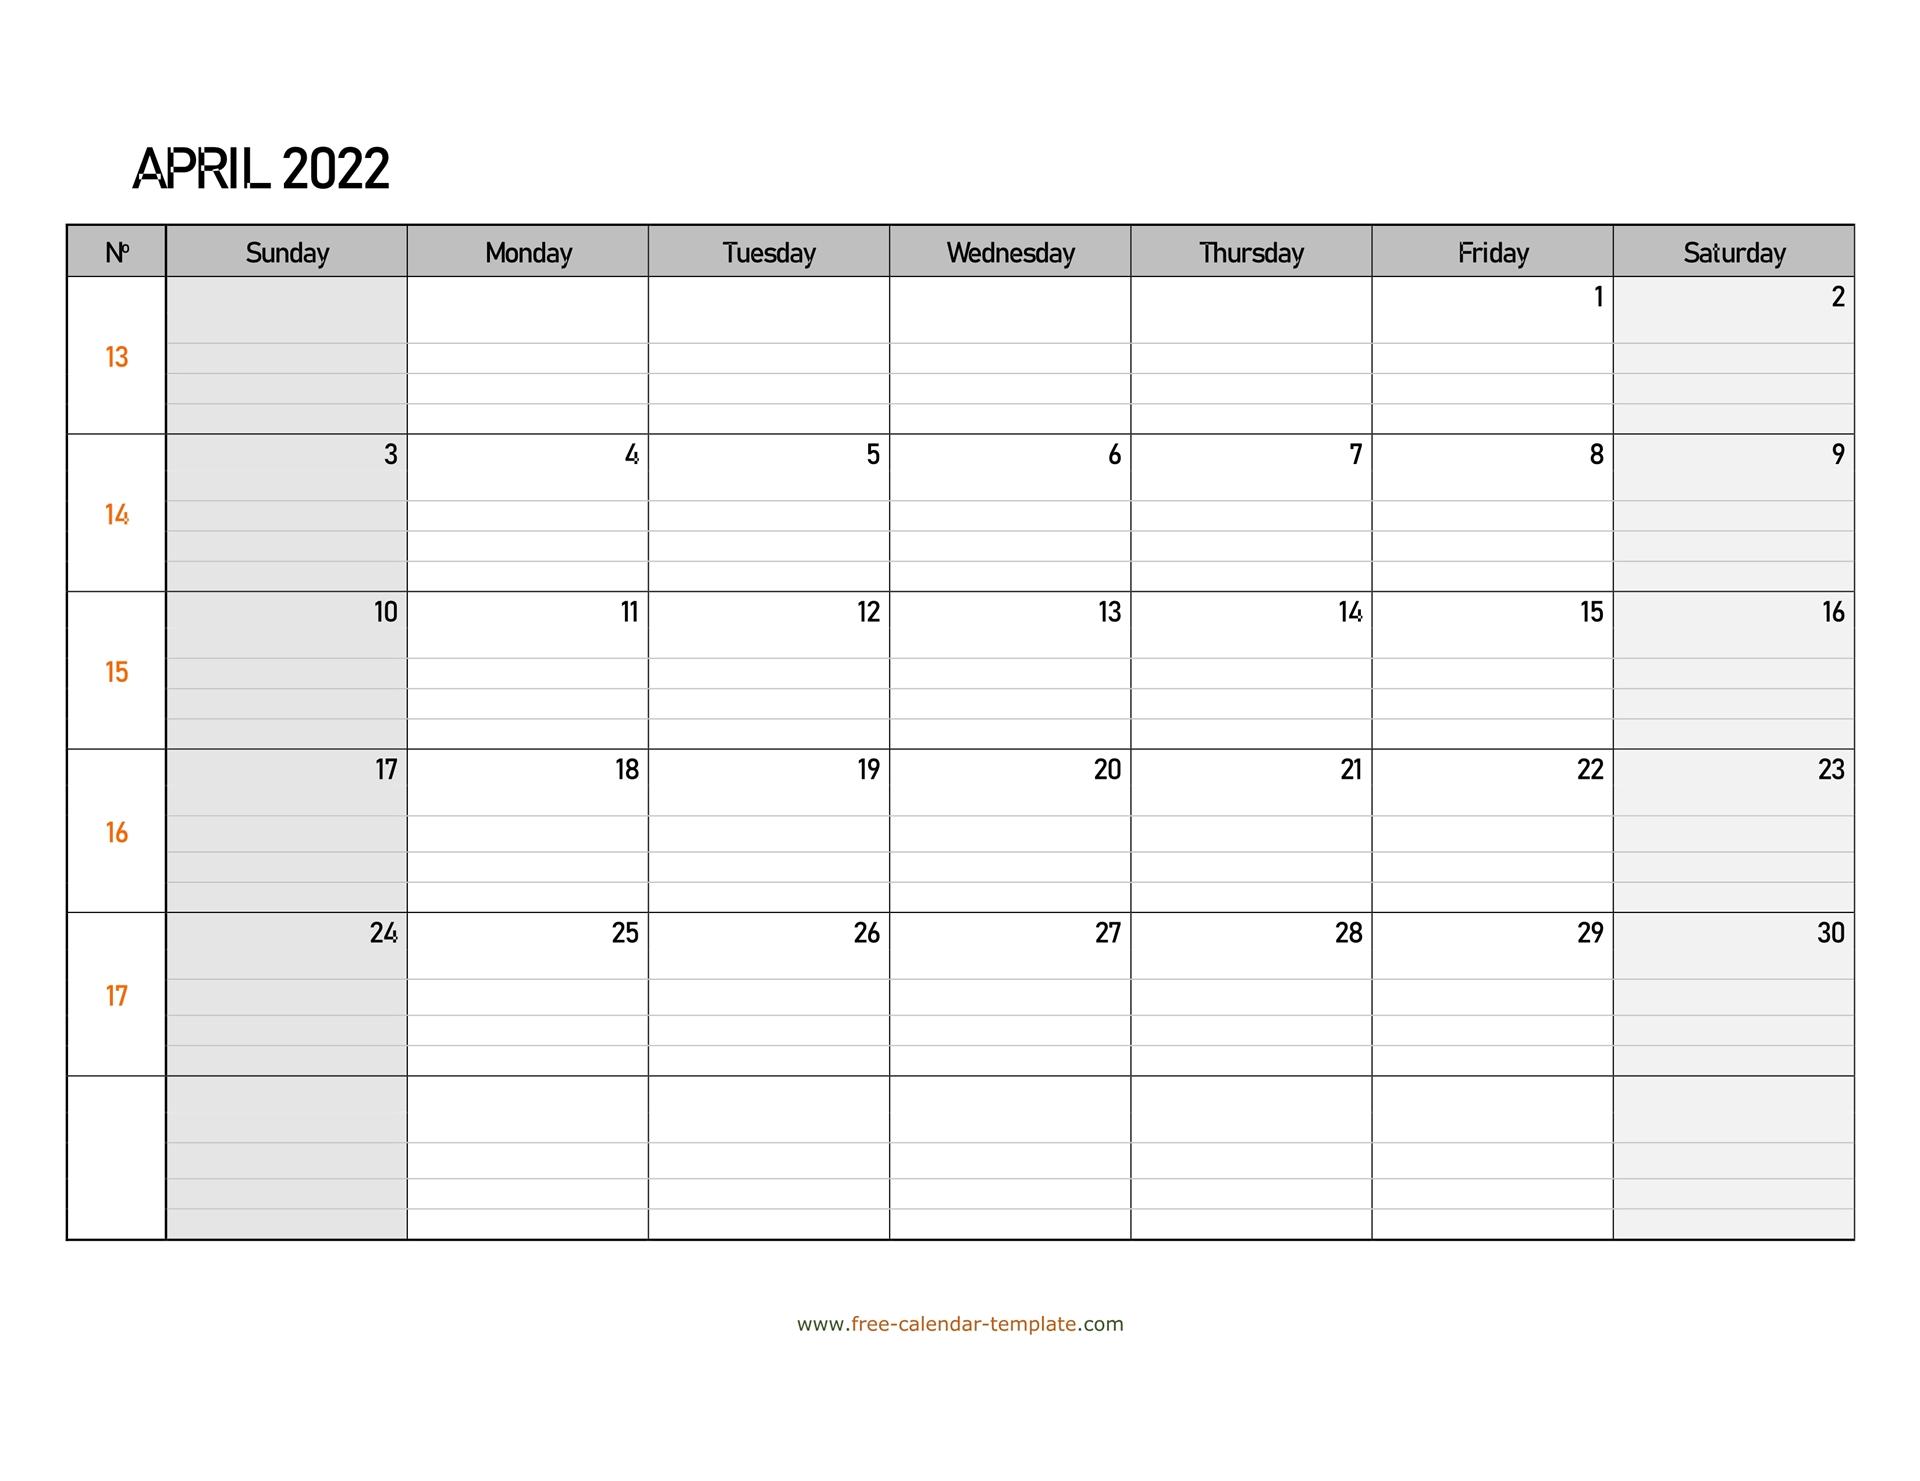 April 2022 Calendar Free Printable With Grid Lines With Regard To March April 2022 Calendar Free Printable